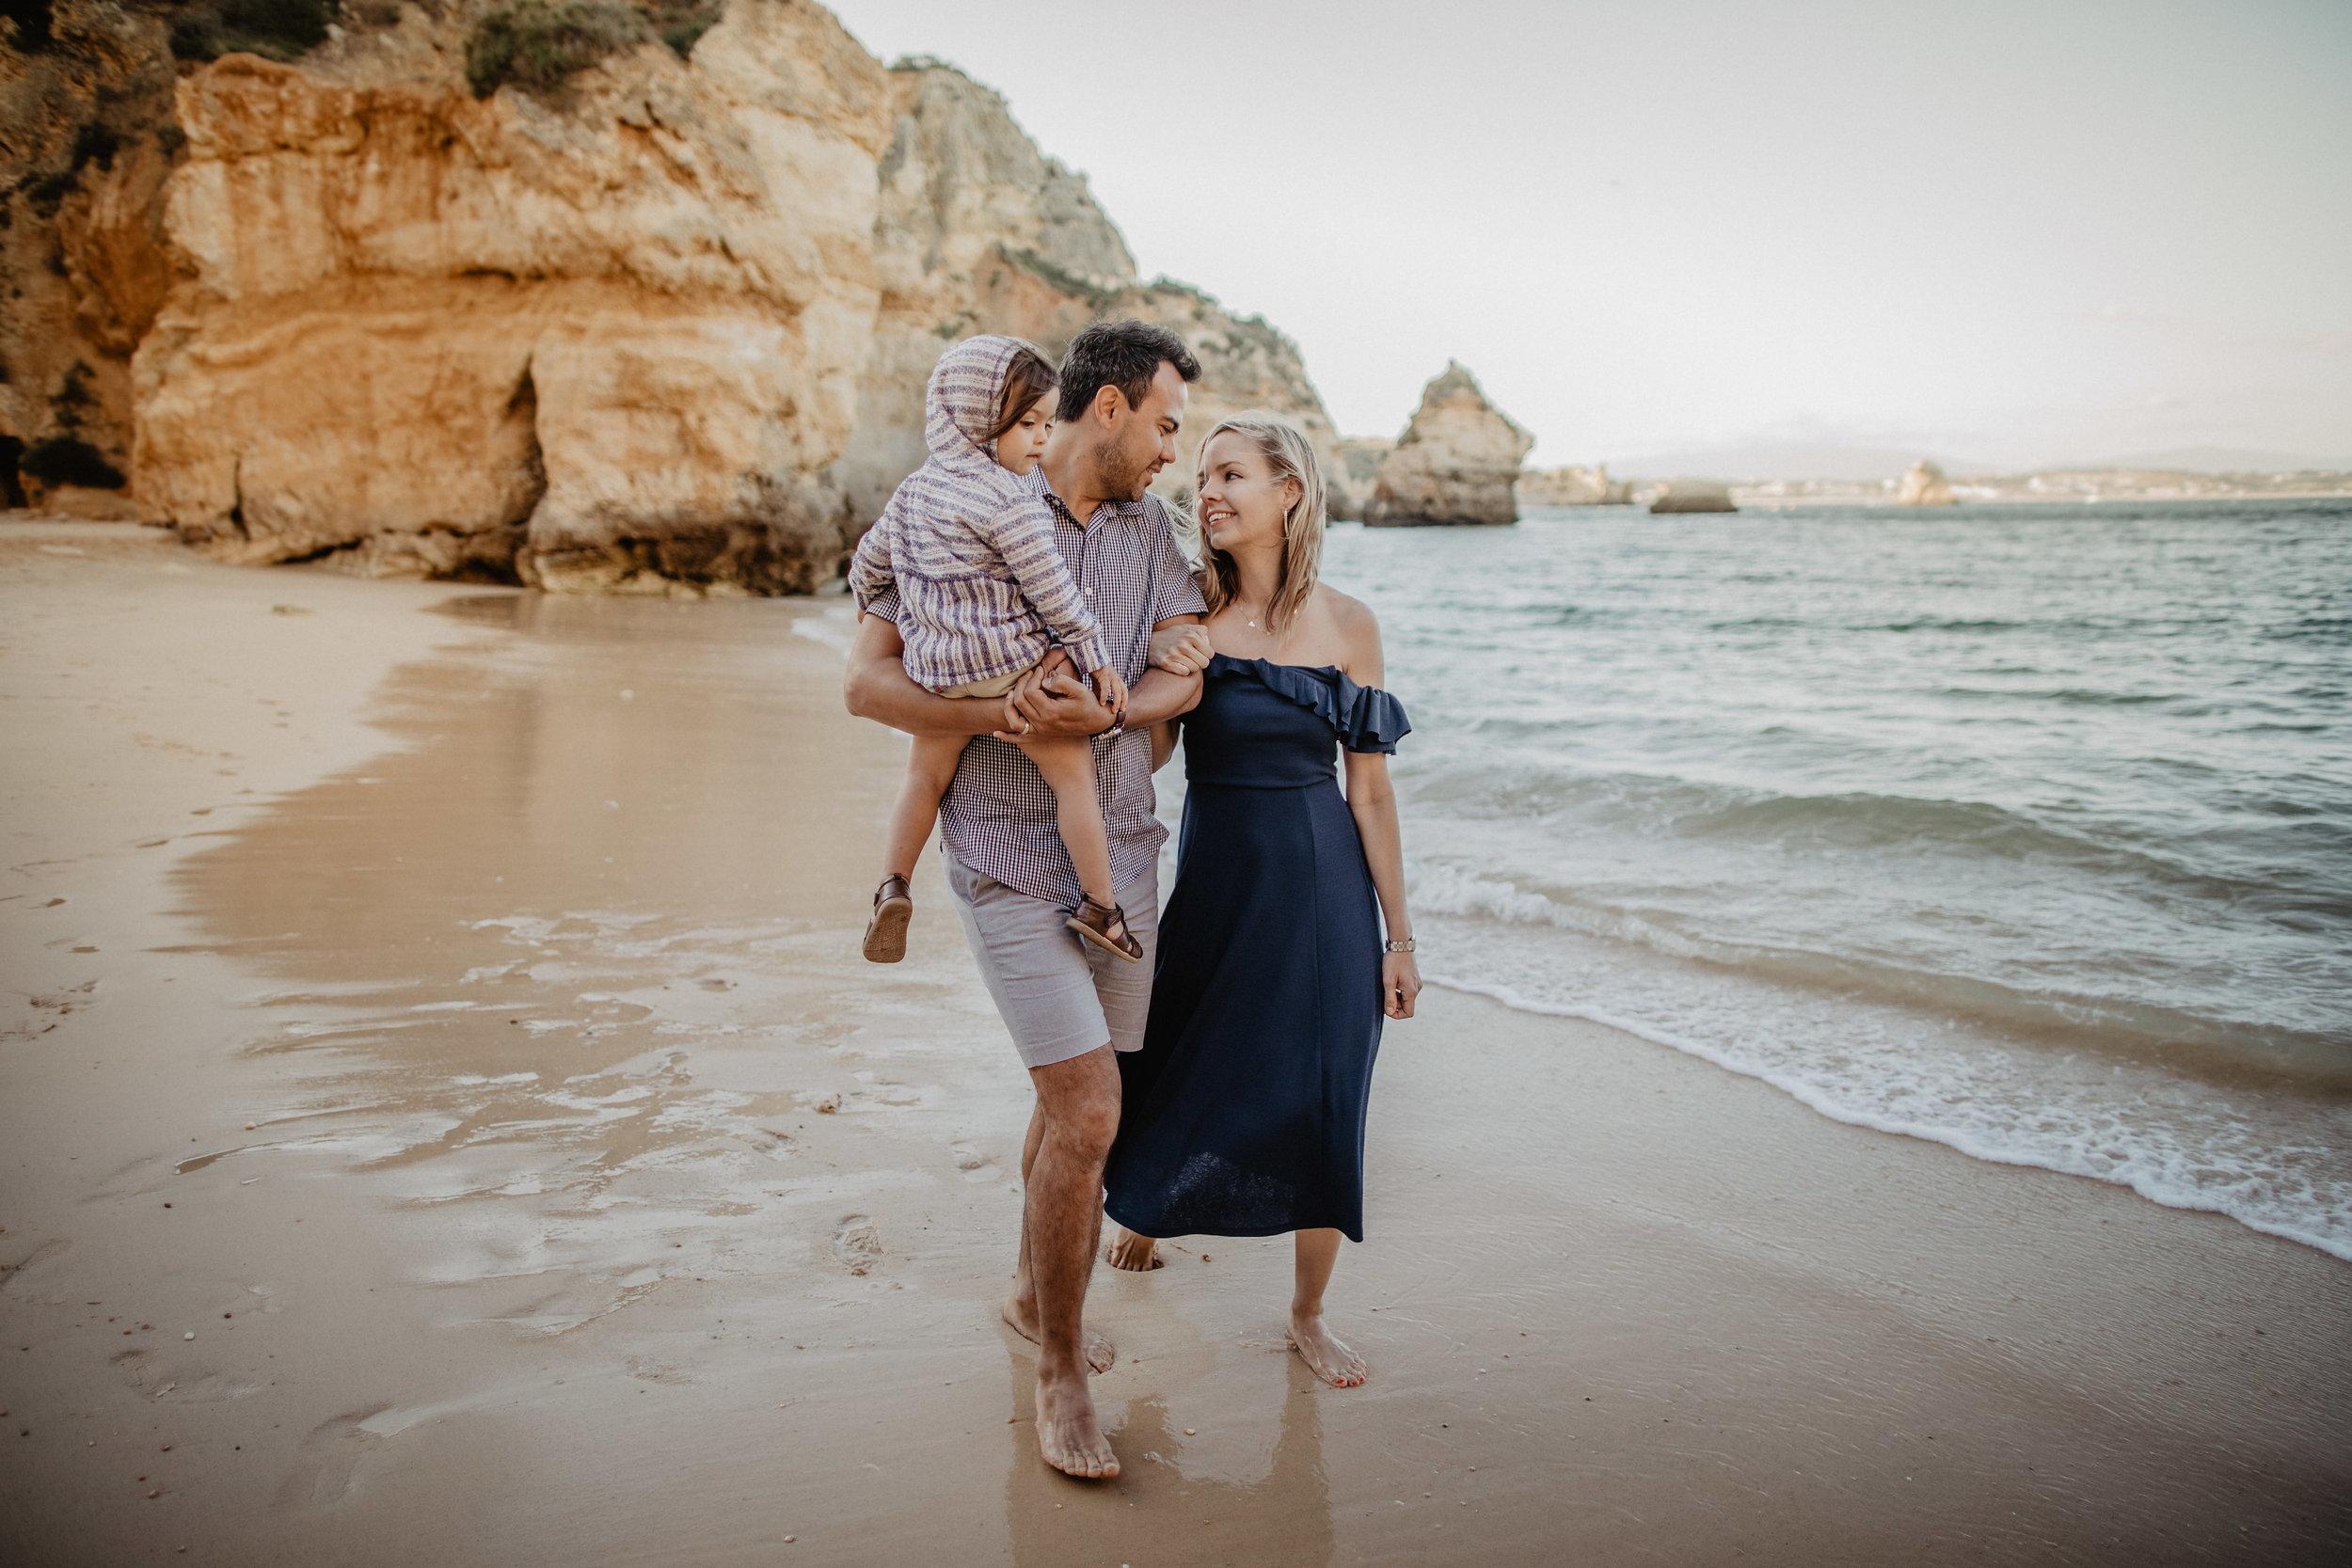 Lapela-Family-photography-Lagos-Algarve29.jpg